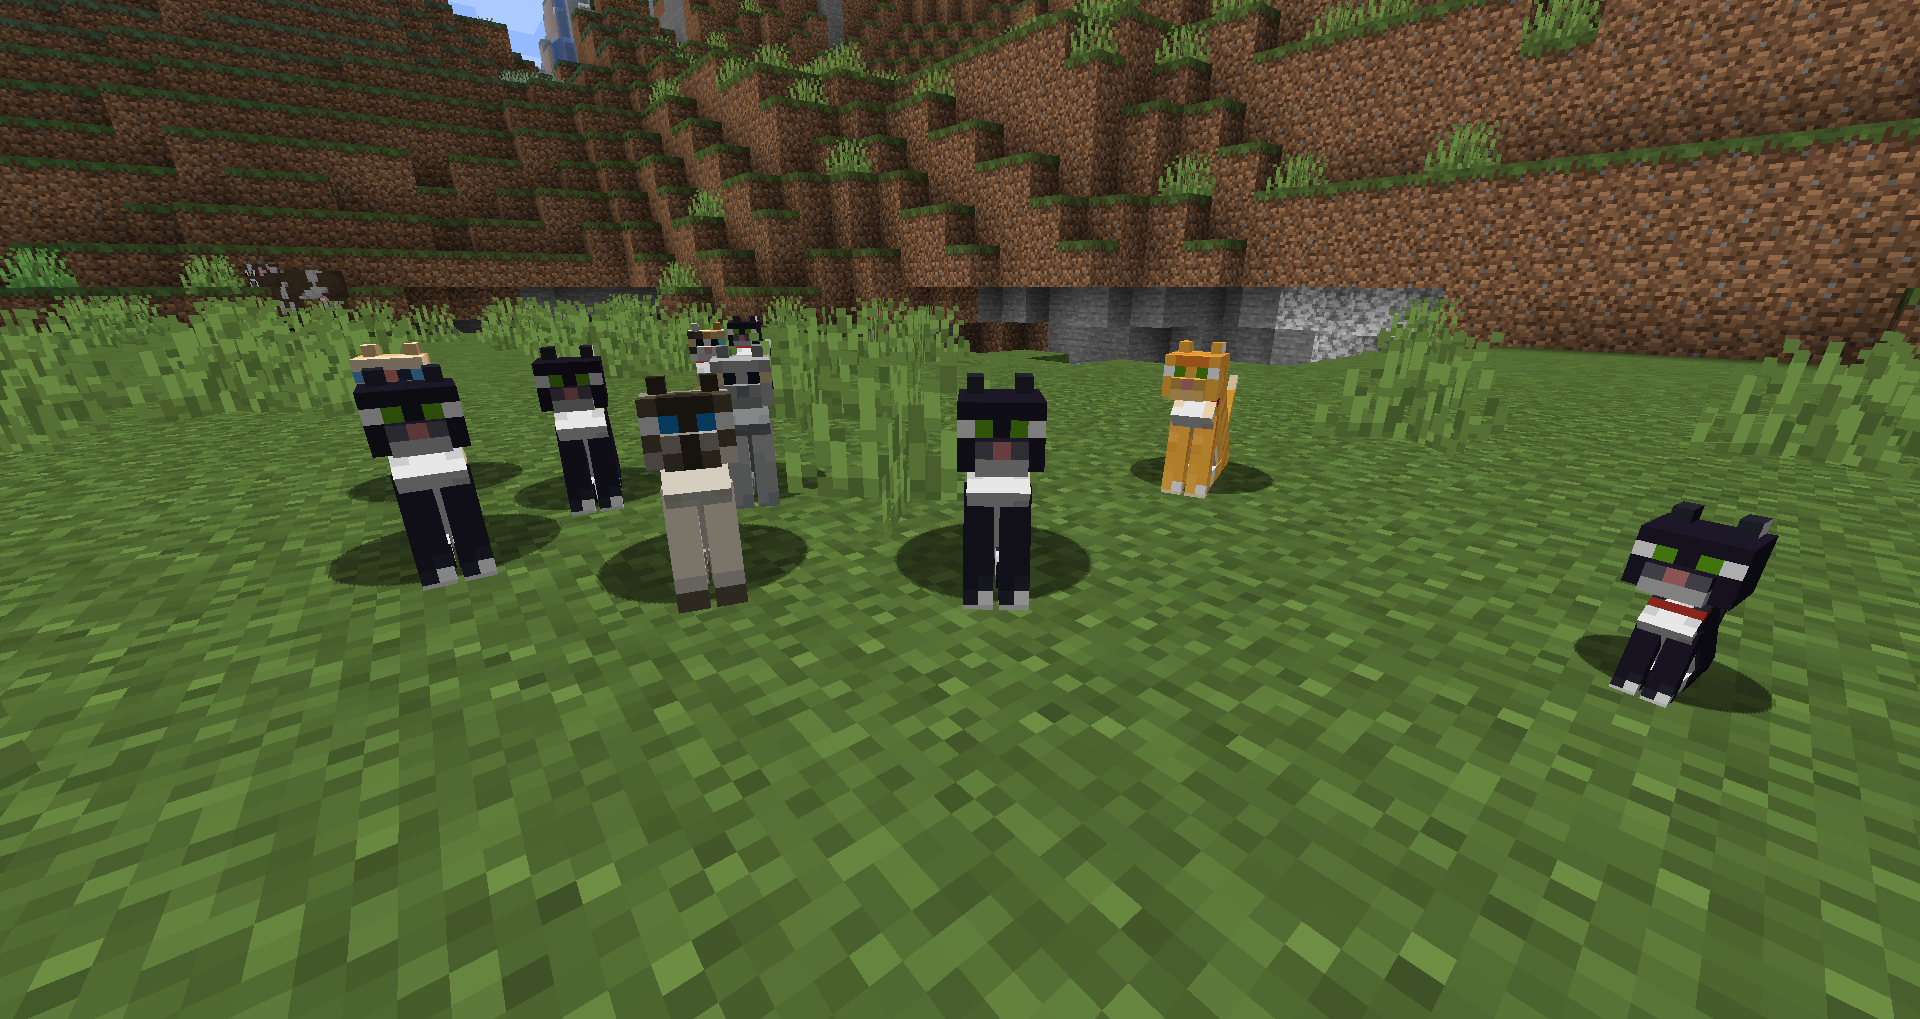 nowe koty minecraft 1.14